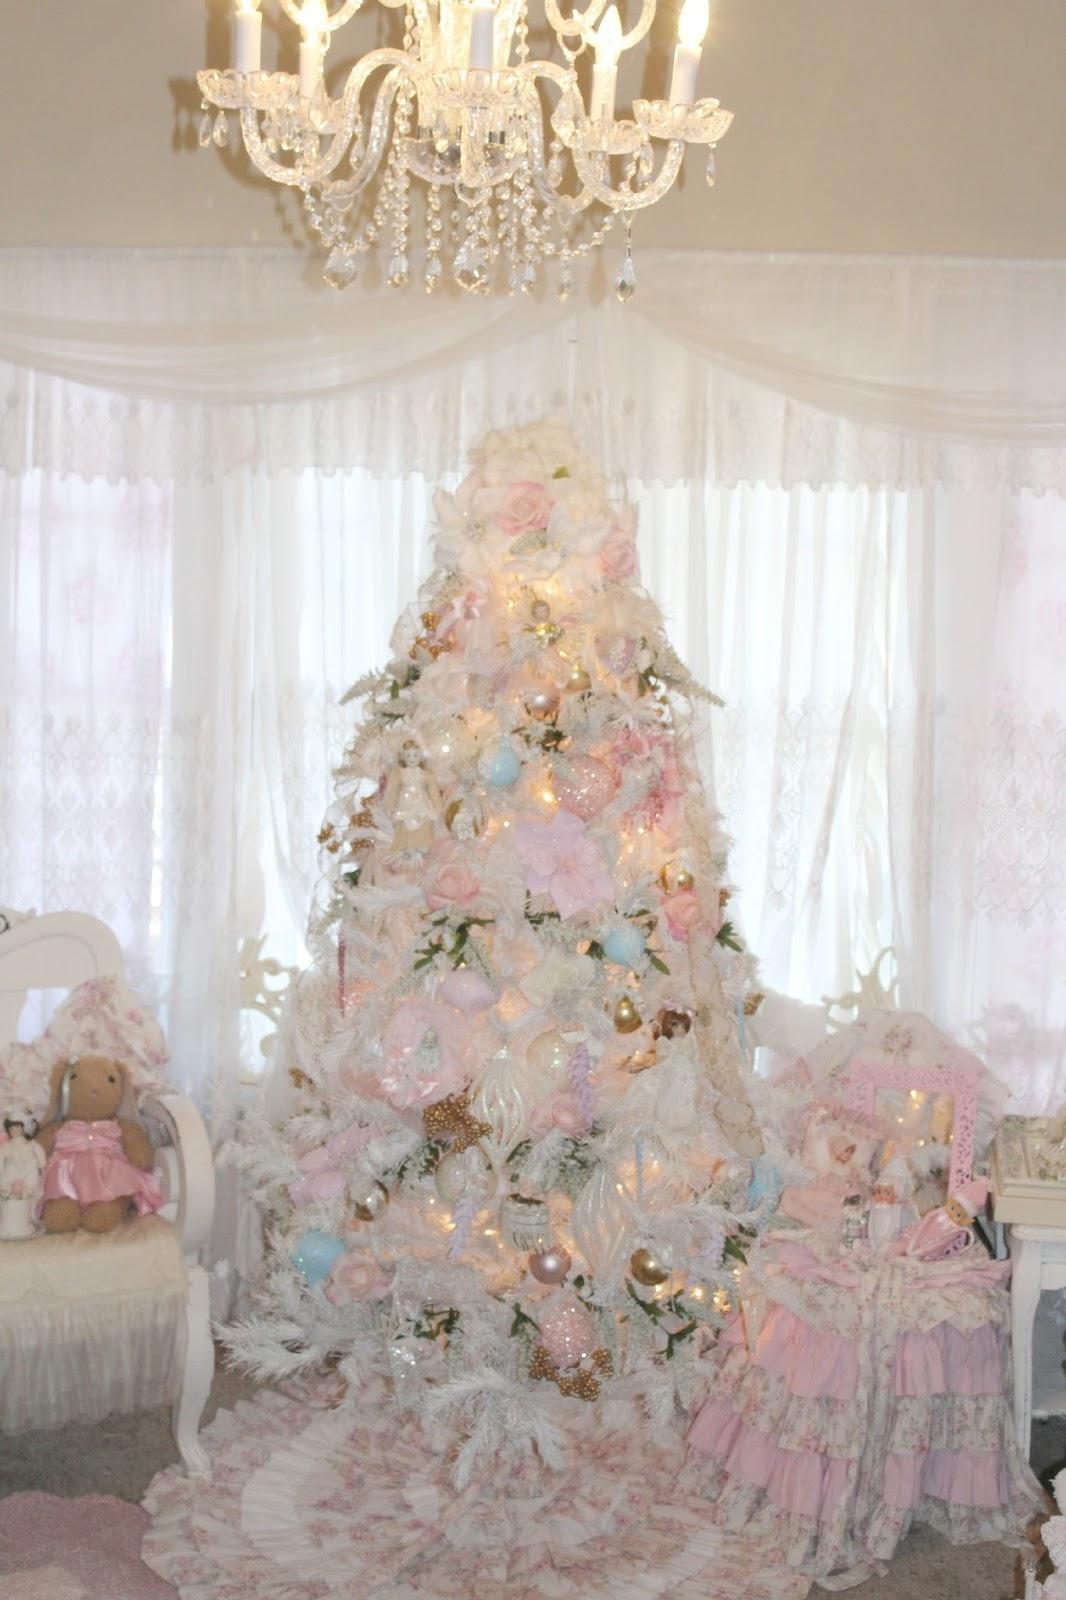 Olivia's Romantic Home: Inexpensive White Christmas Tree ...